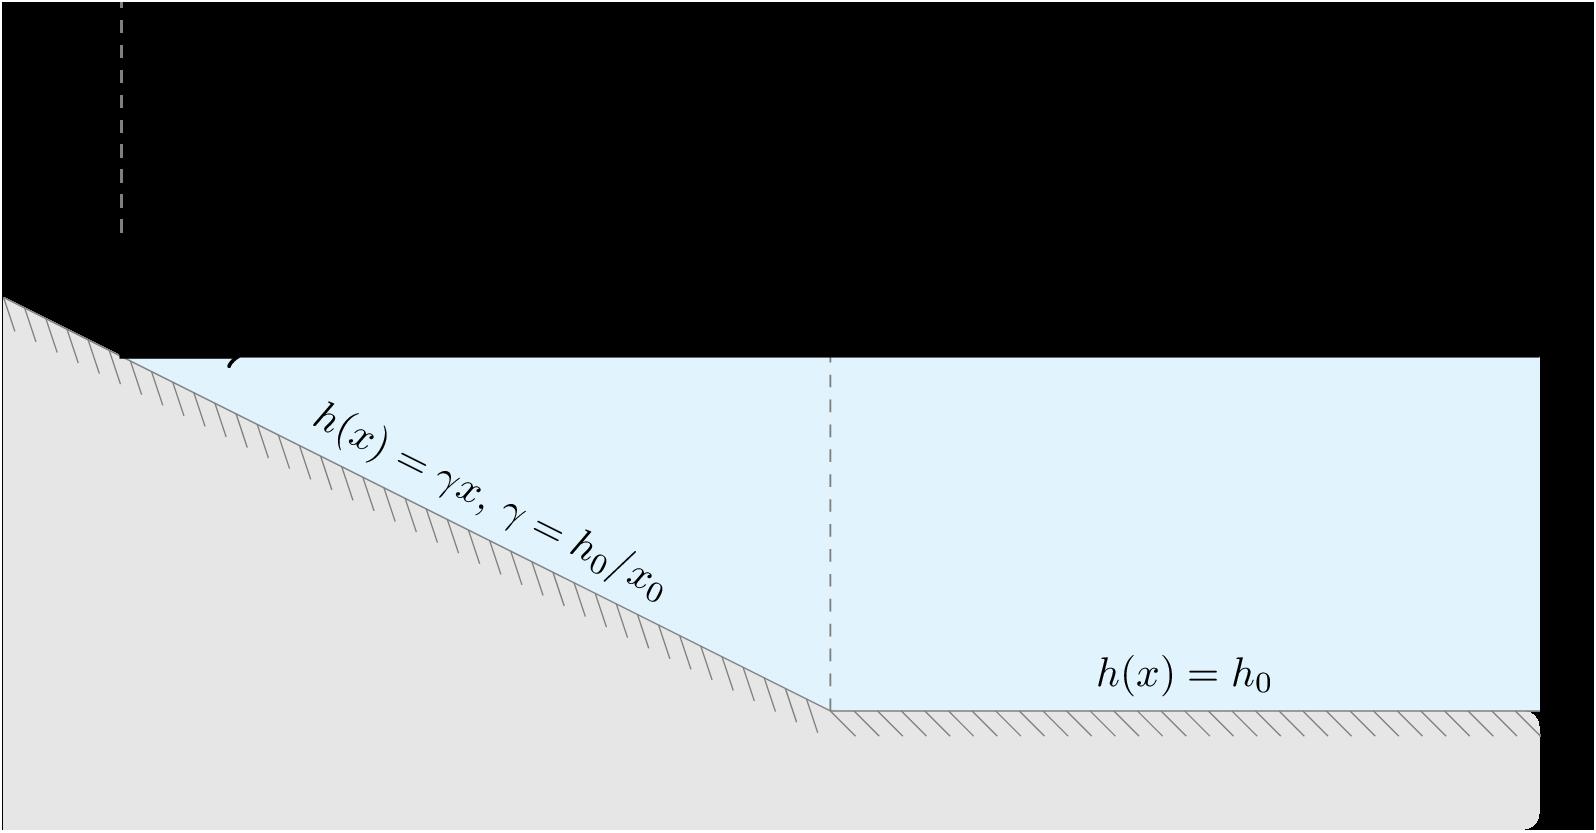 tikz_watersurface_slope_flat.png